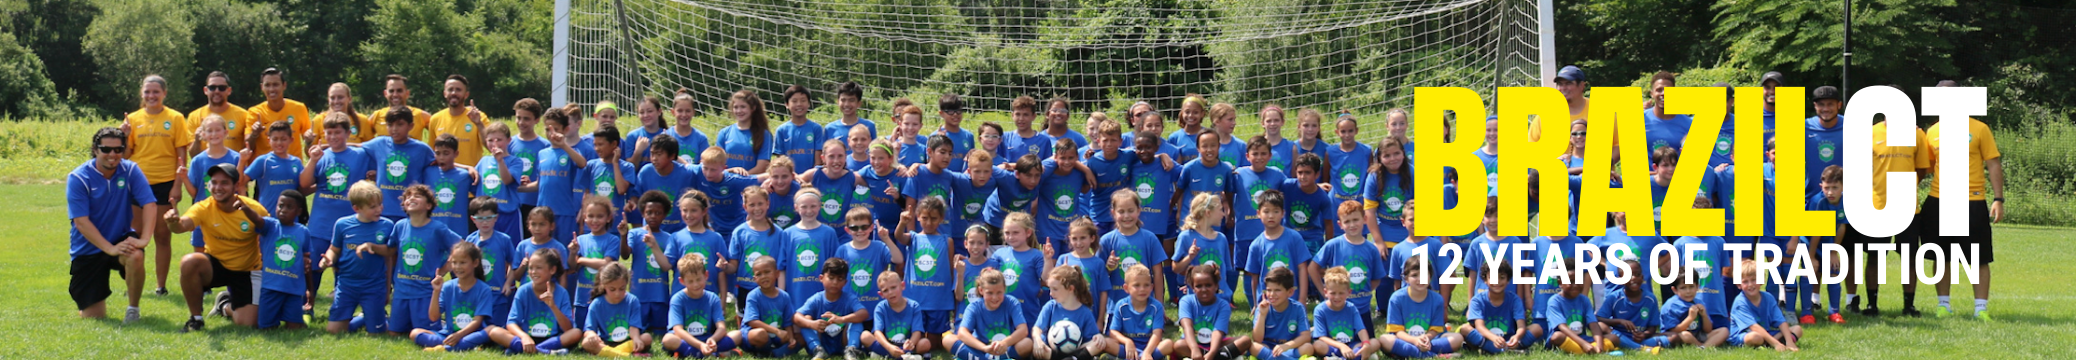 Brazil CT Soccer Teams, Soccer, Goal, Field